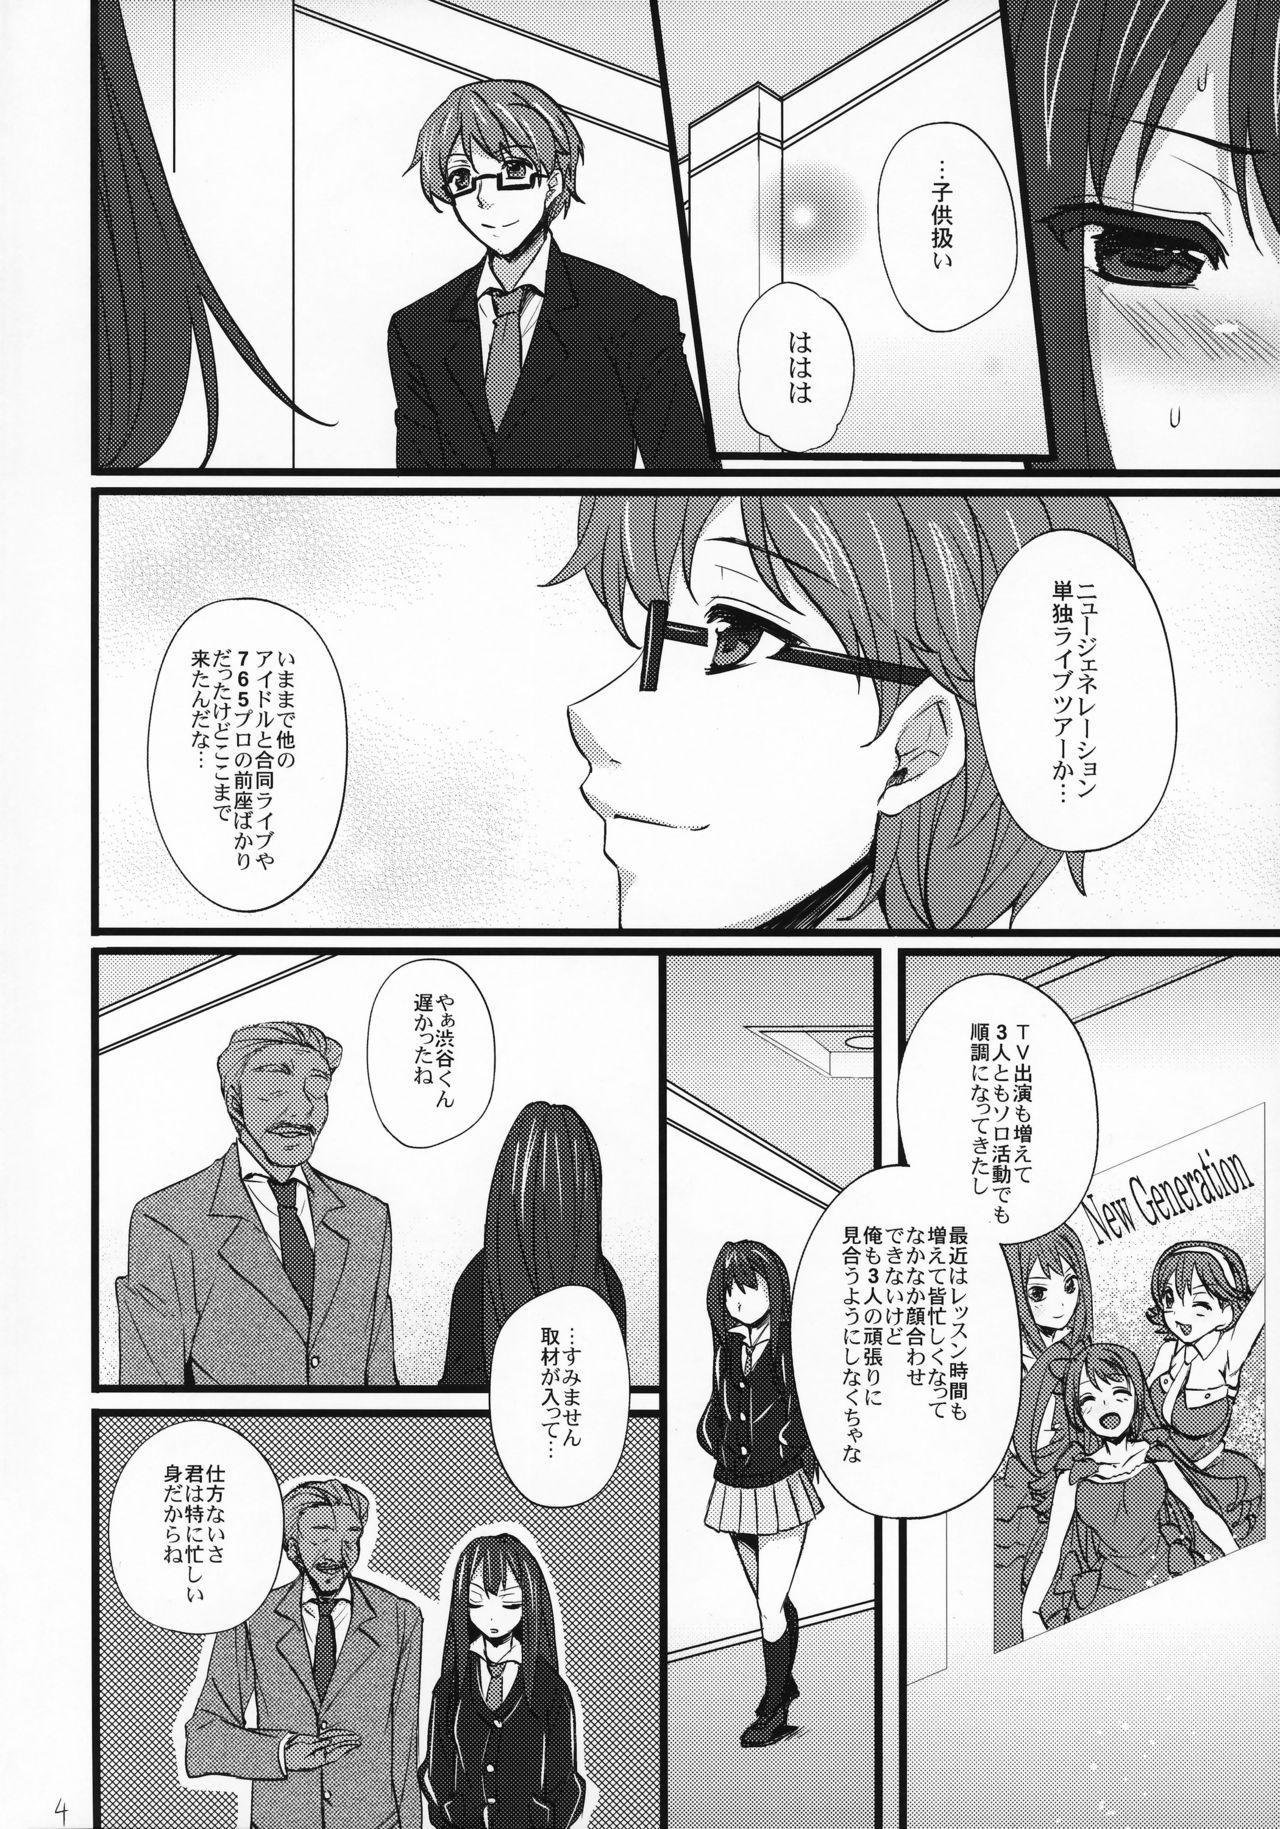 Shinsedai Parade 2